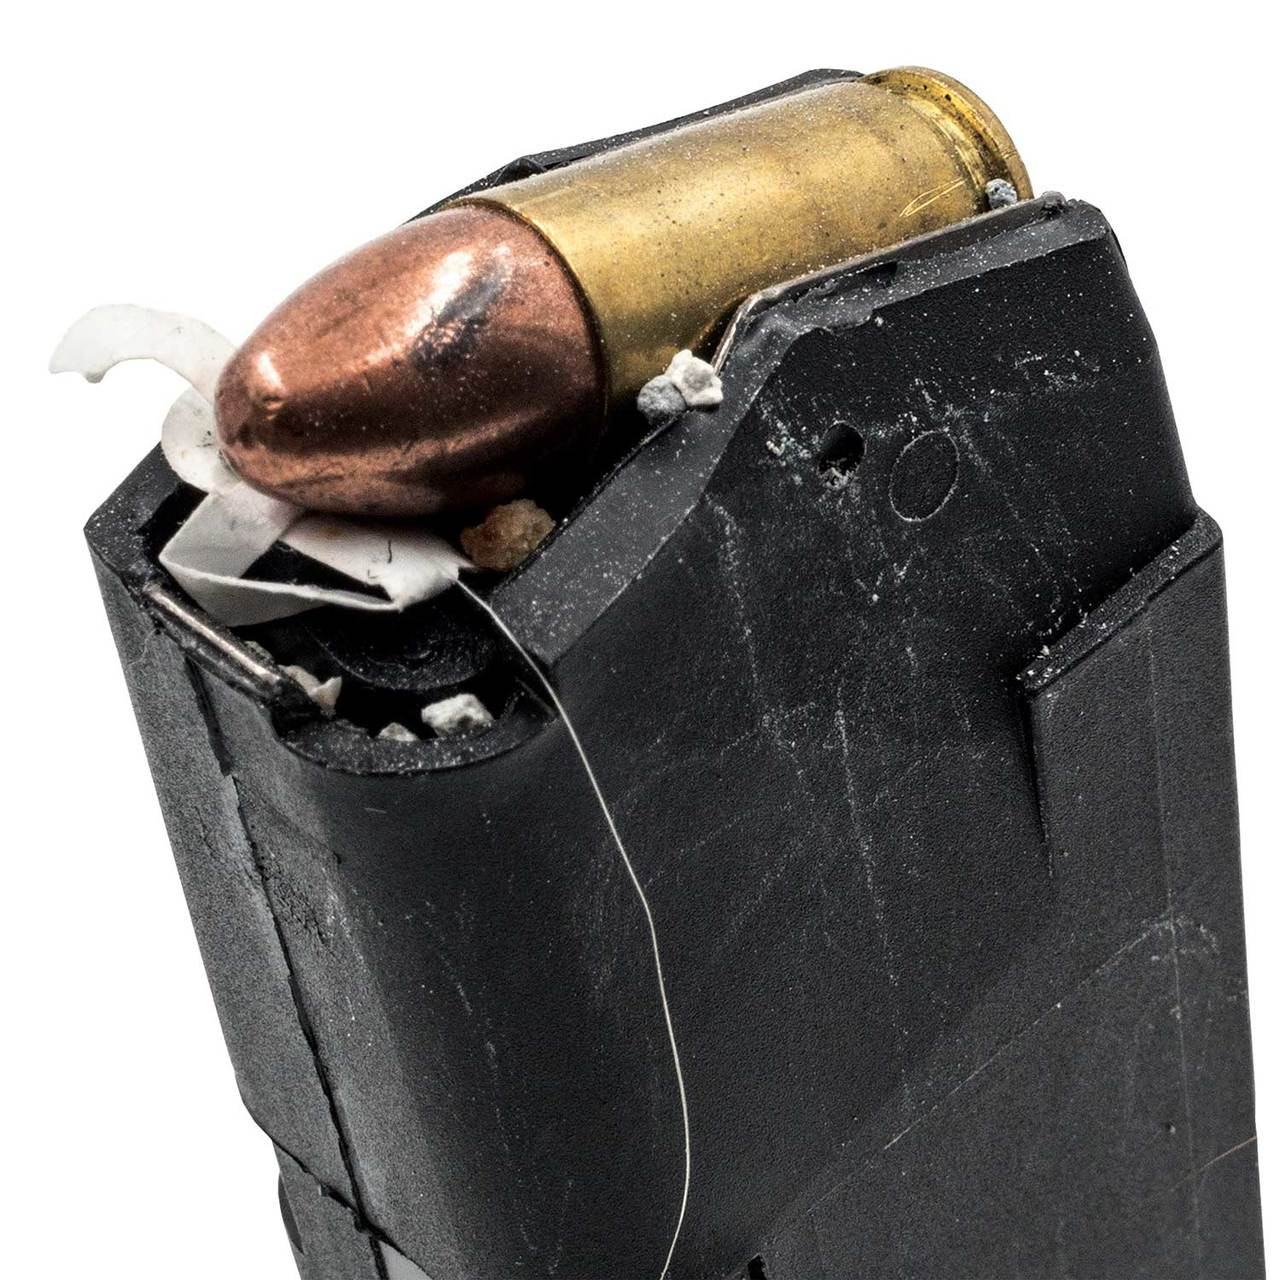 Glock 23 Ammo Armor